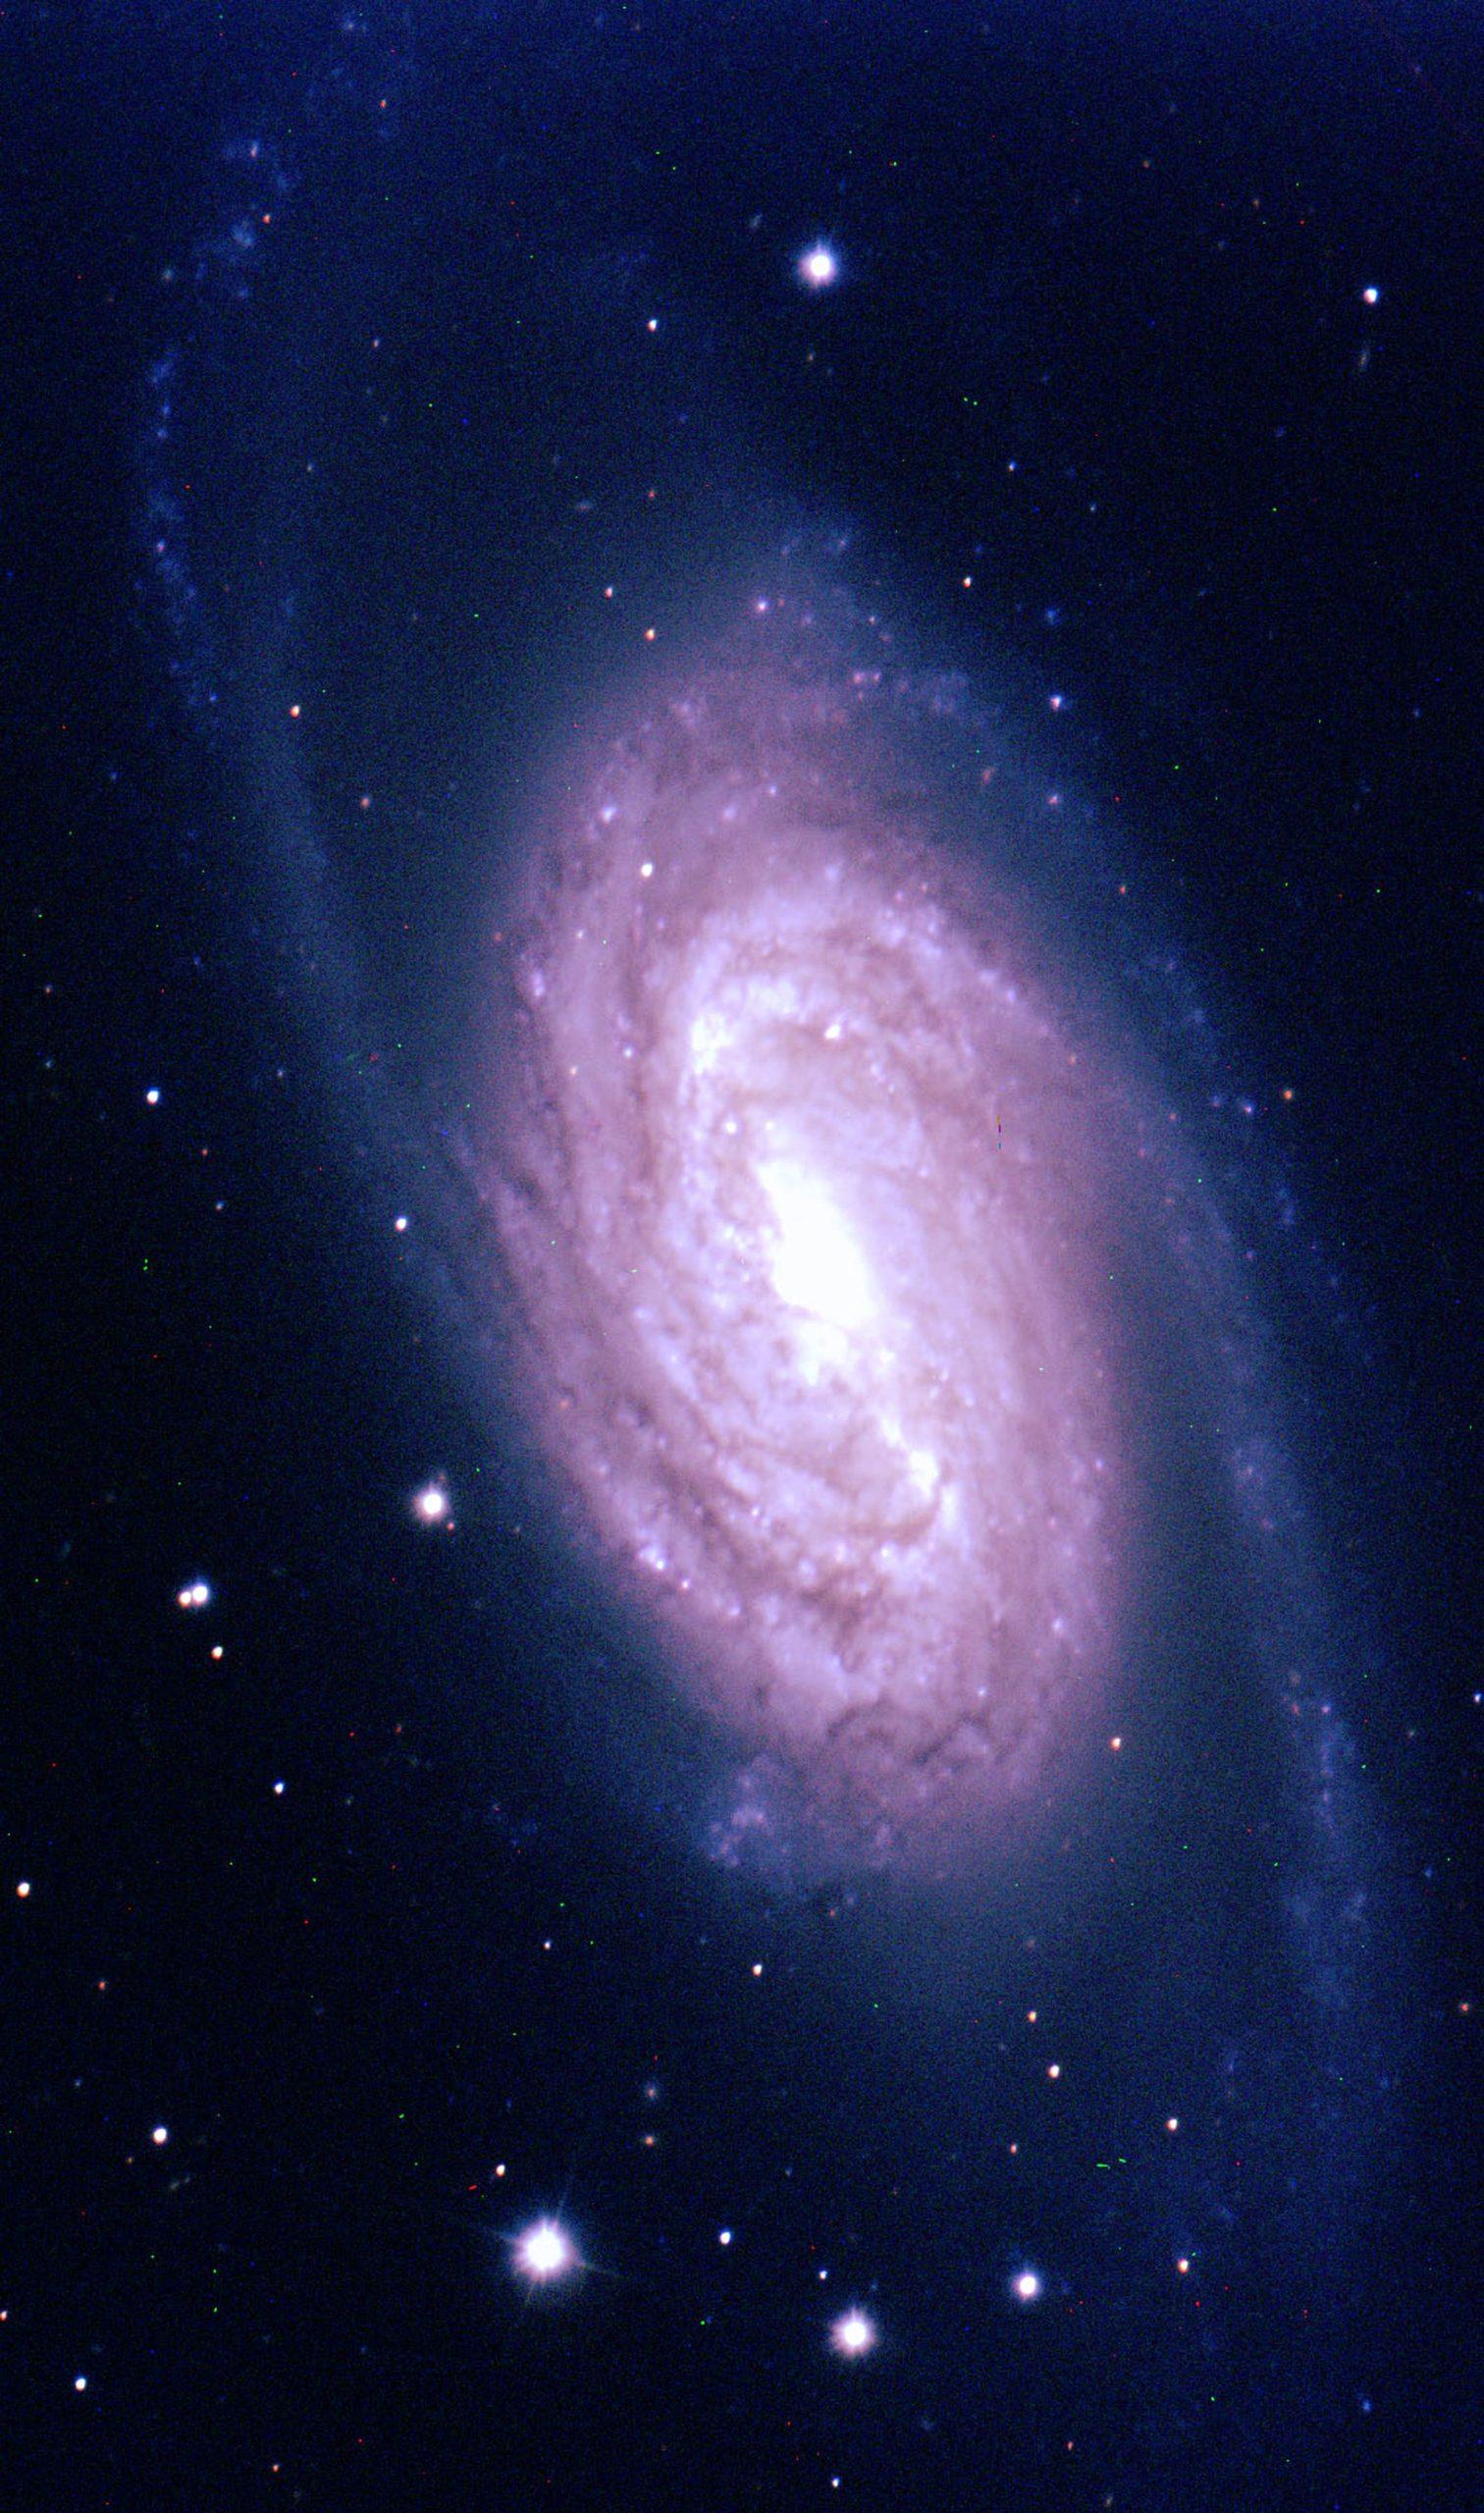 Galaxy NGC 2903